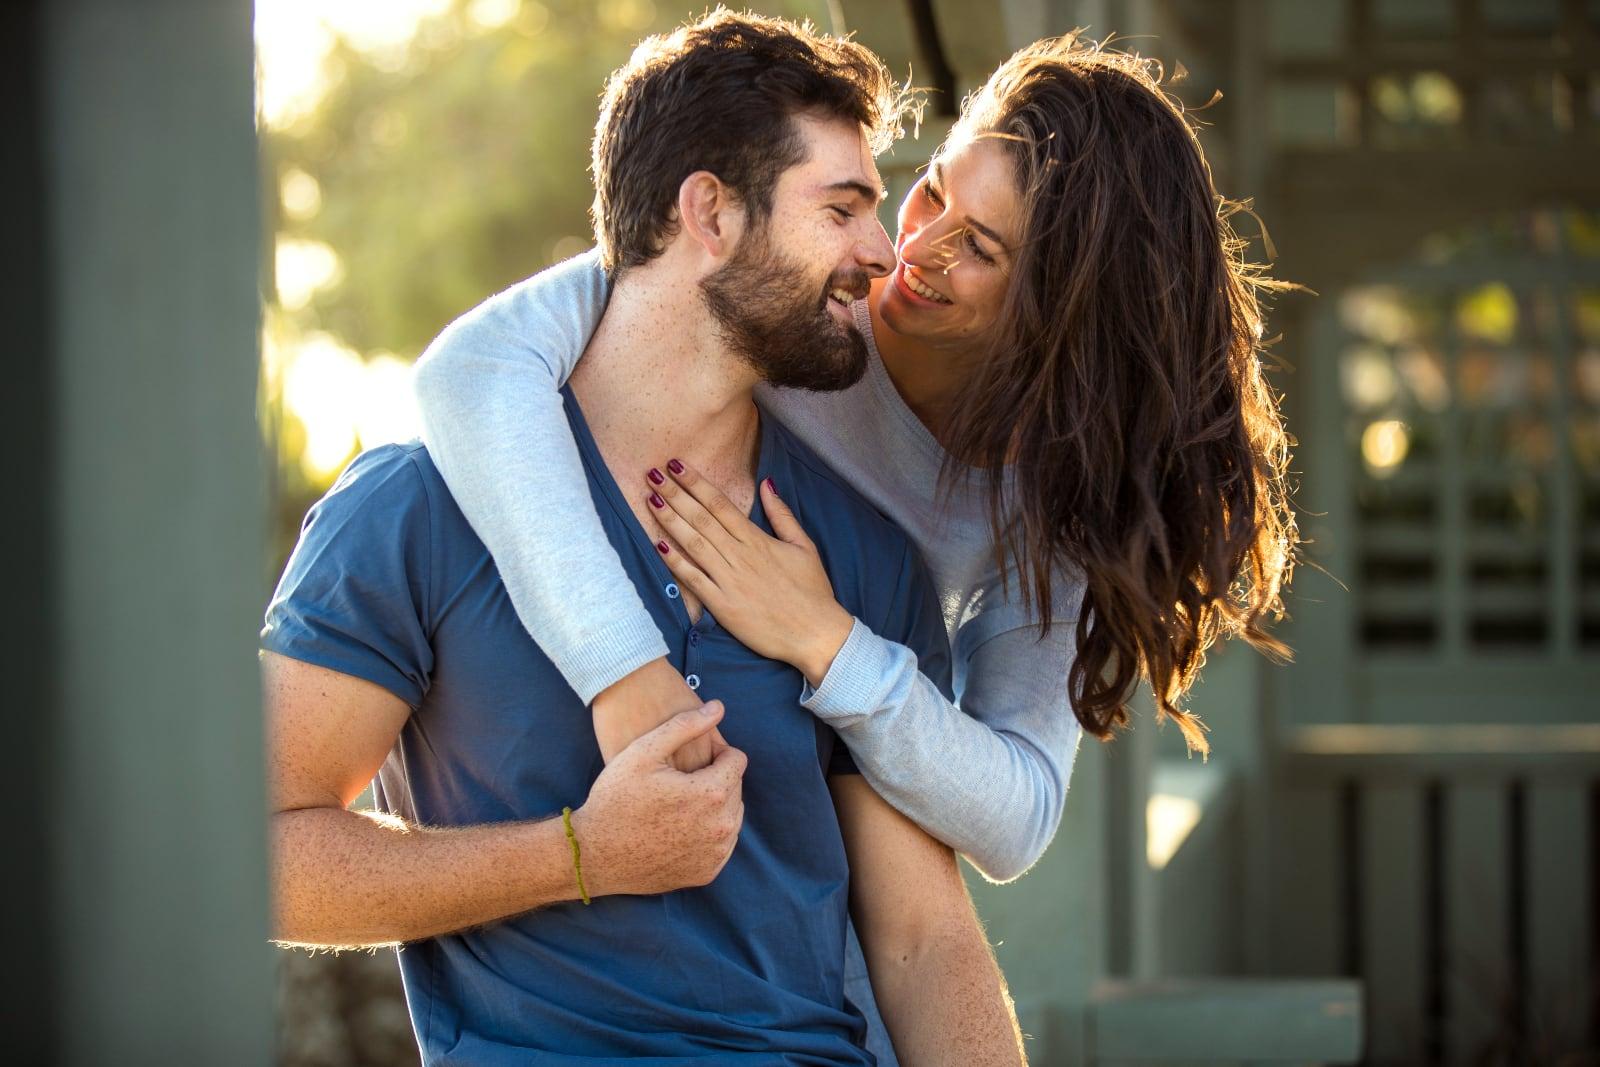 woman hugs man in the park